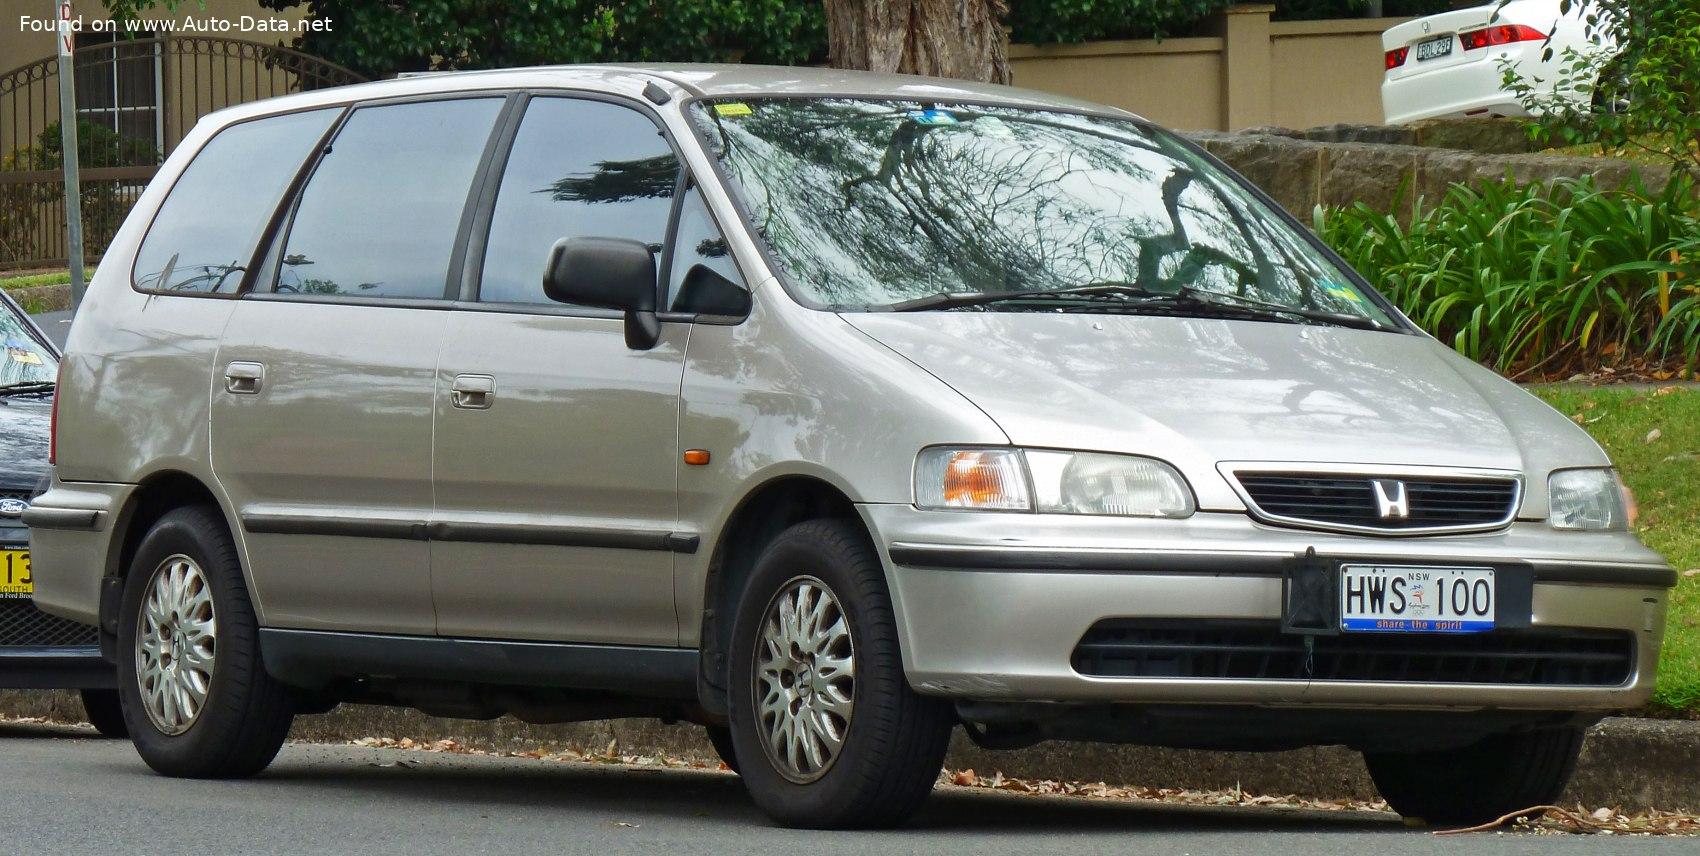 1994 Honda Odyssey I 2.2i (150 Hp)   Technical specs, data ...